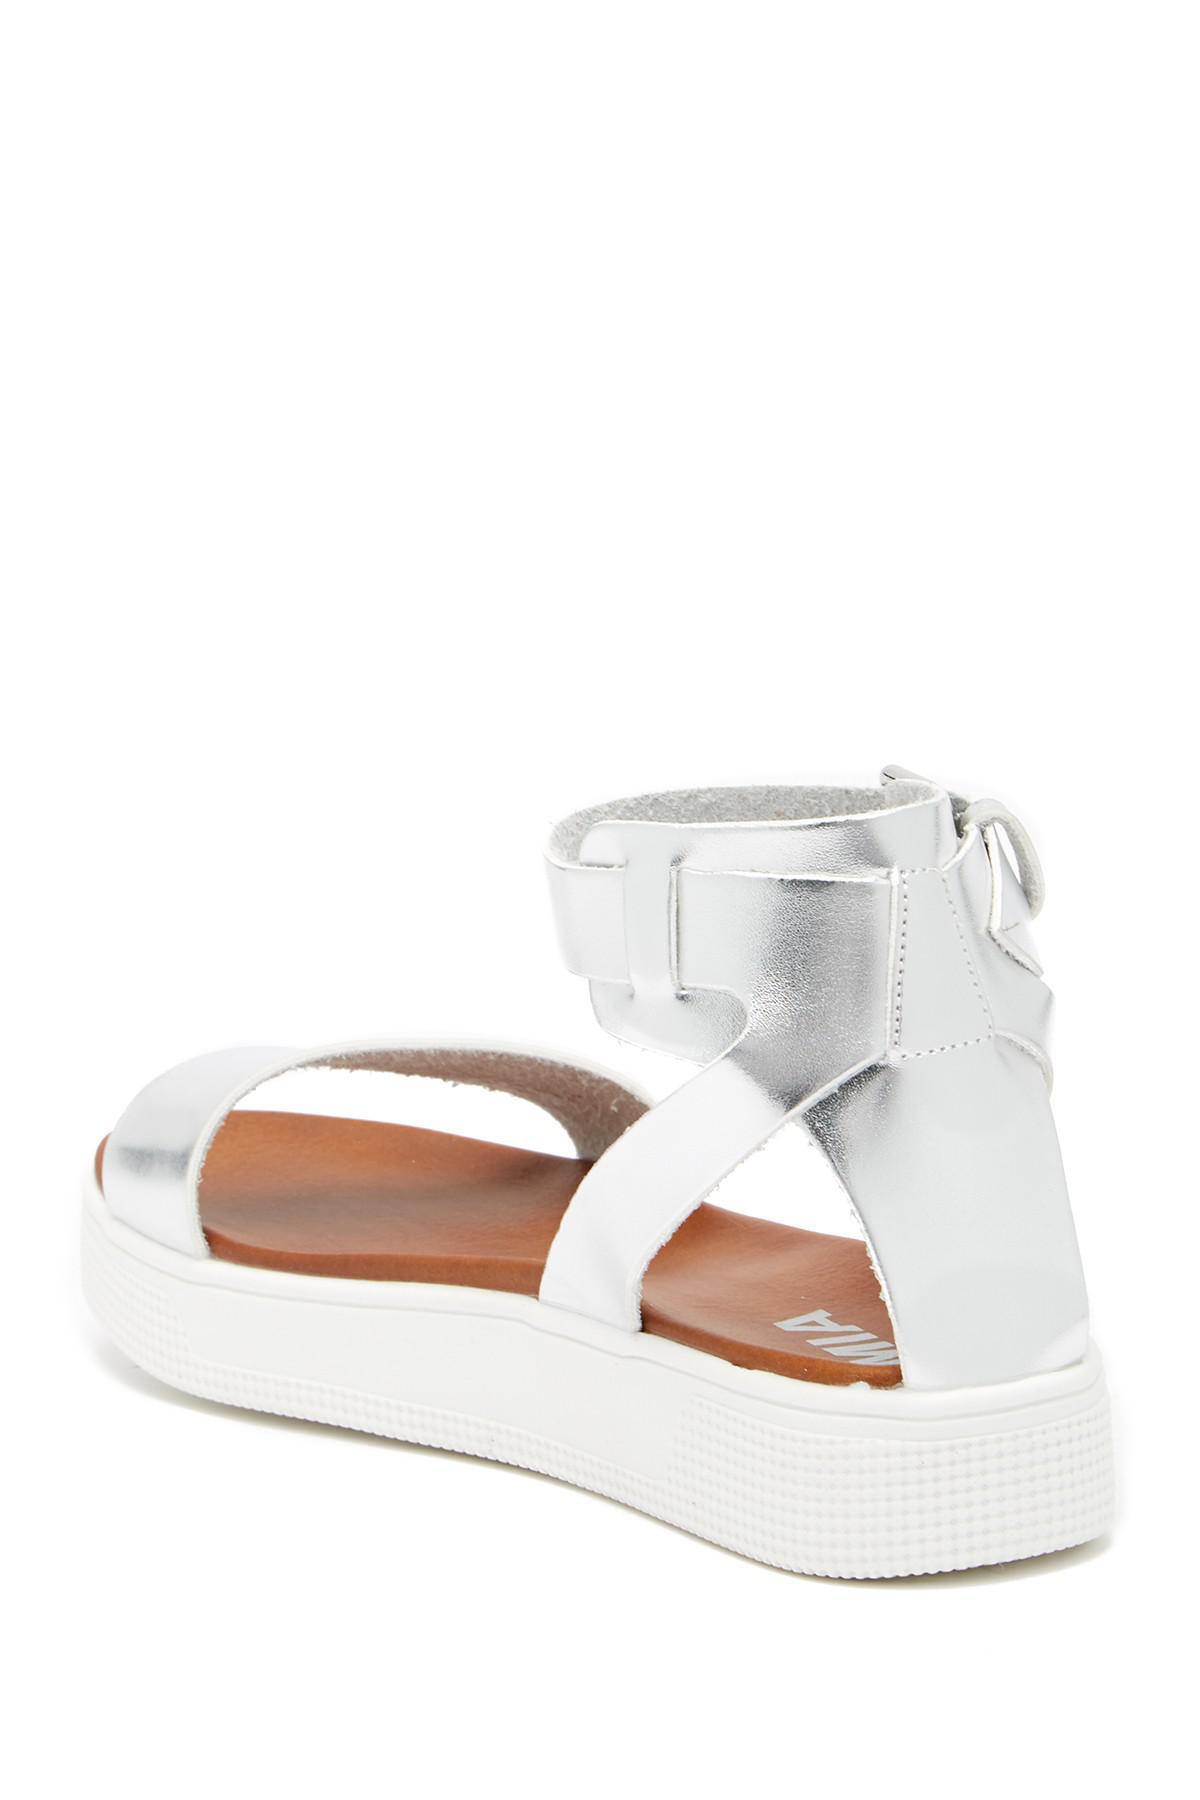 a8e496e2056 Lyst - MIA Katherin Platform Sandal in Metallic